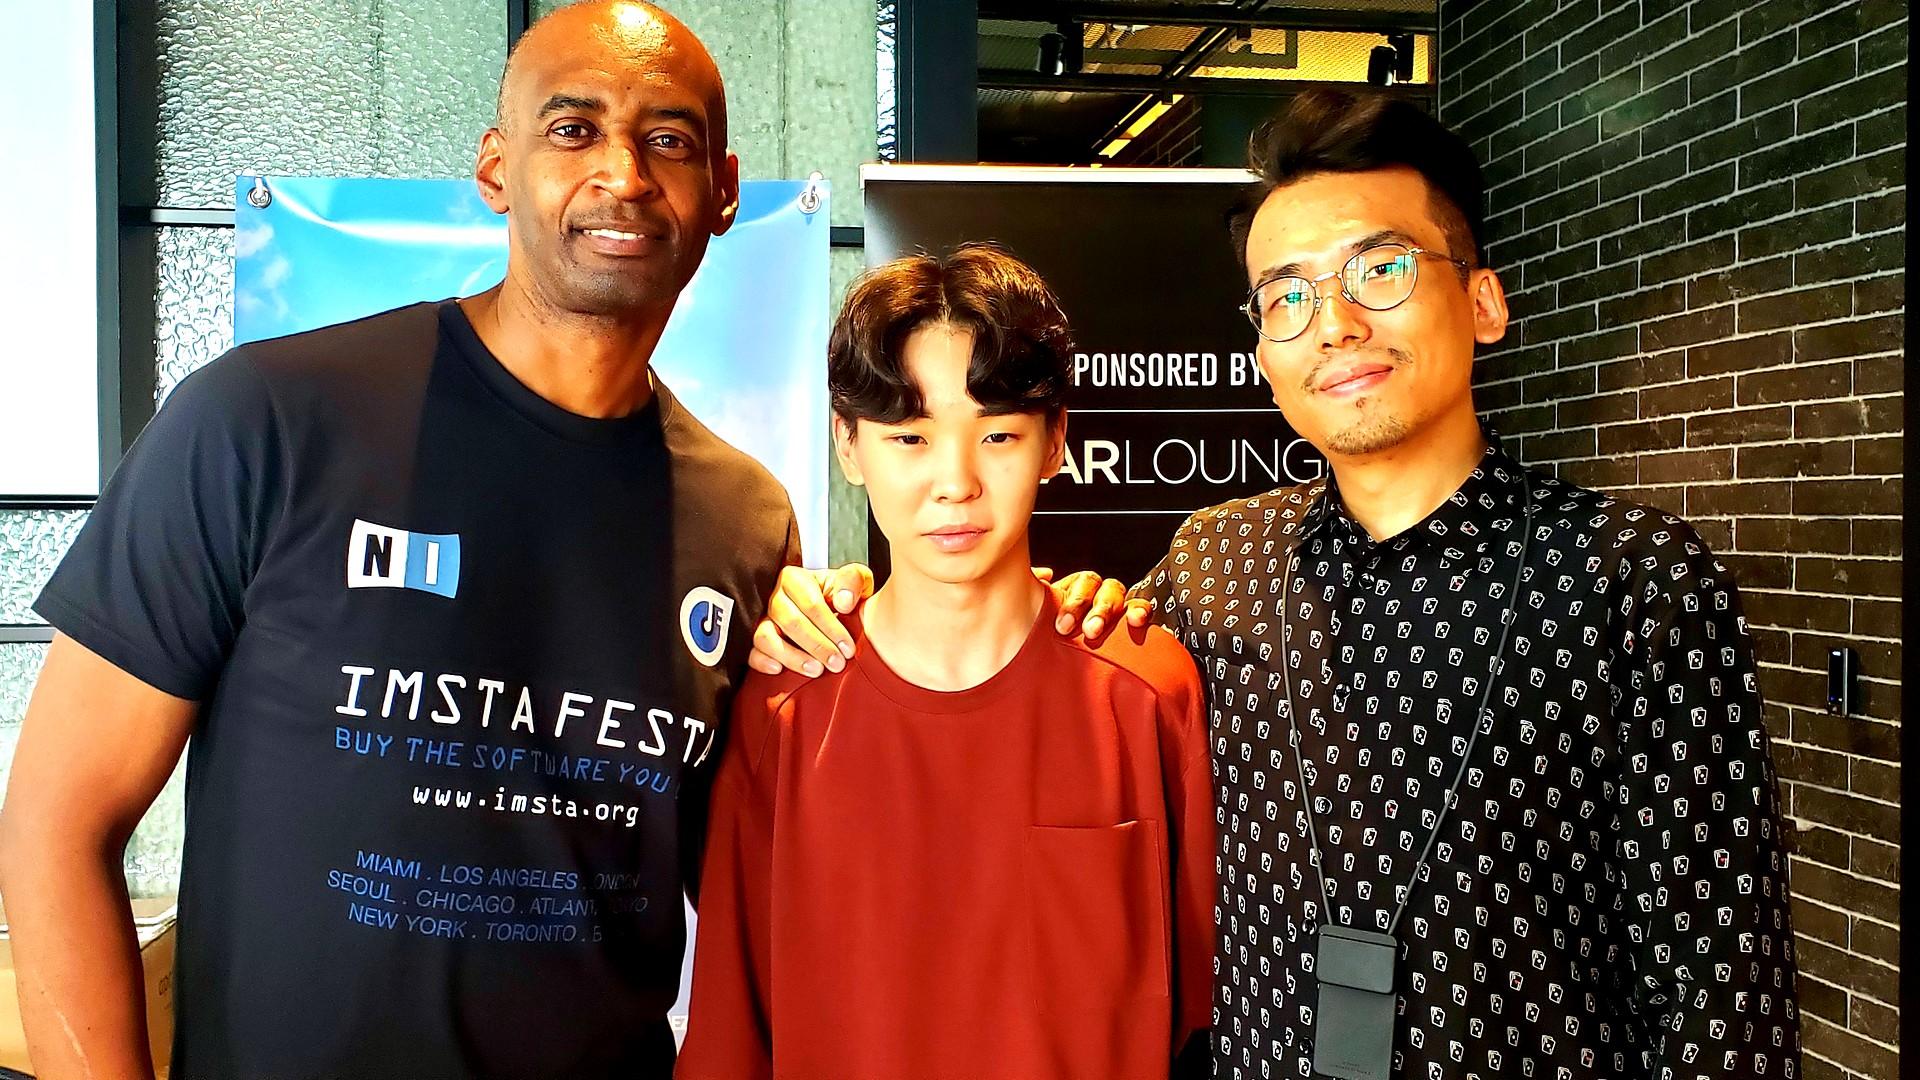 Lee Byung Wook of South Korea Wins IMSTA FESTA's 2018